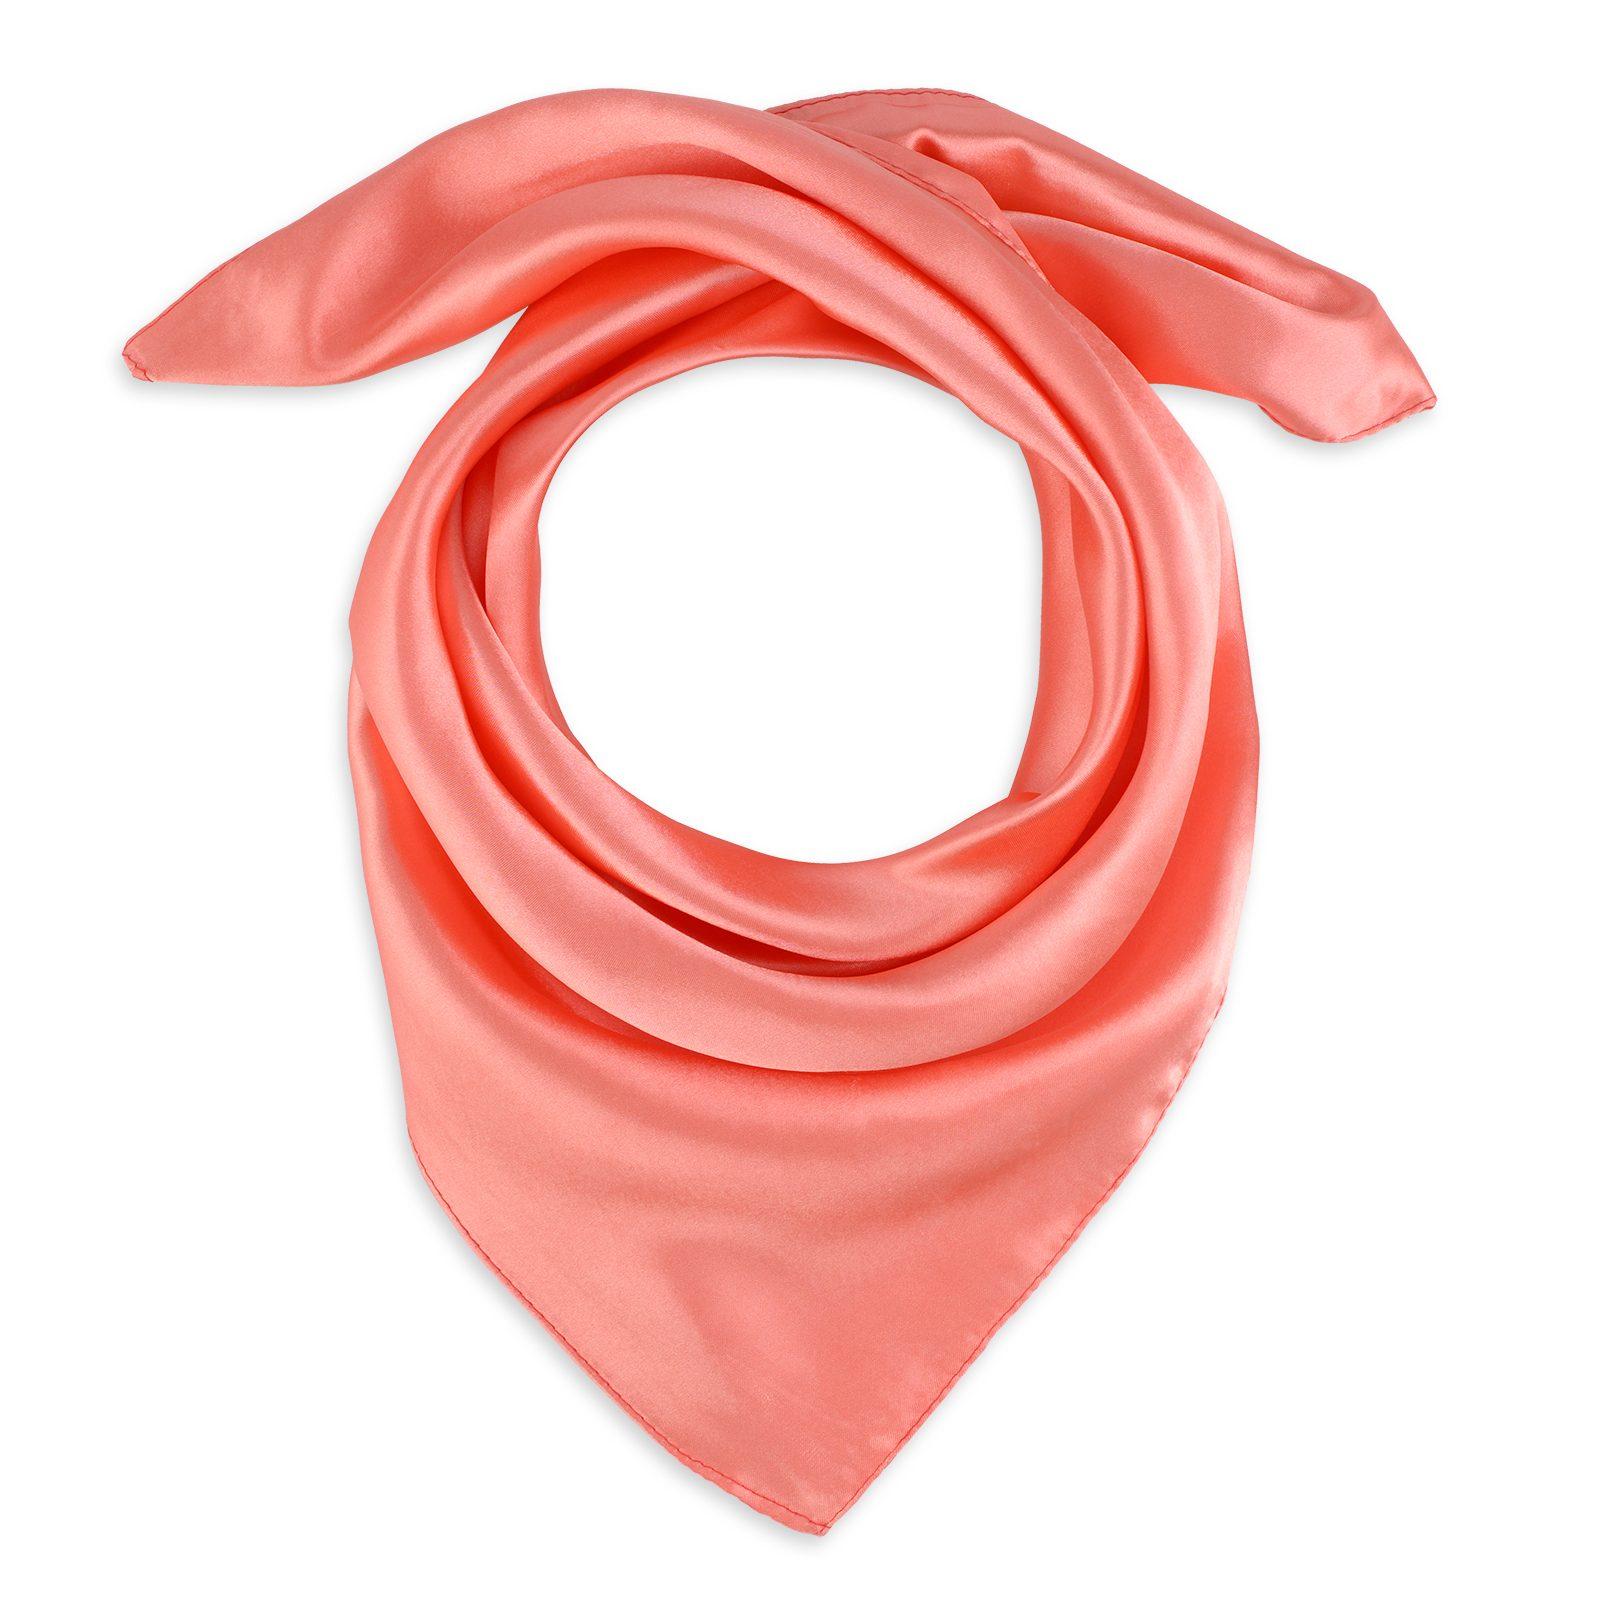 http://lookbook.allee-du-foulard.fr/wp-content/uploads/2018/11/AT-03714-peche-F16-foulard-carre-polysatin-eazy-corail-1600x1600.jpg